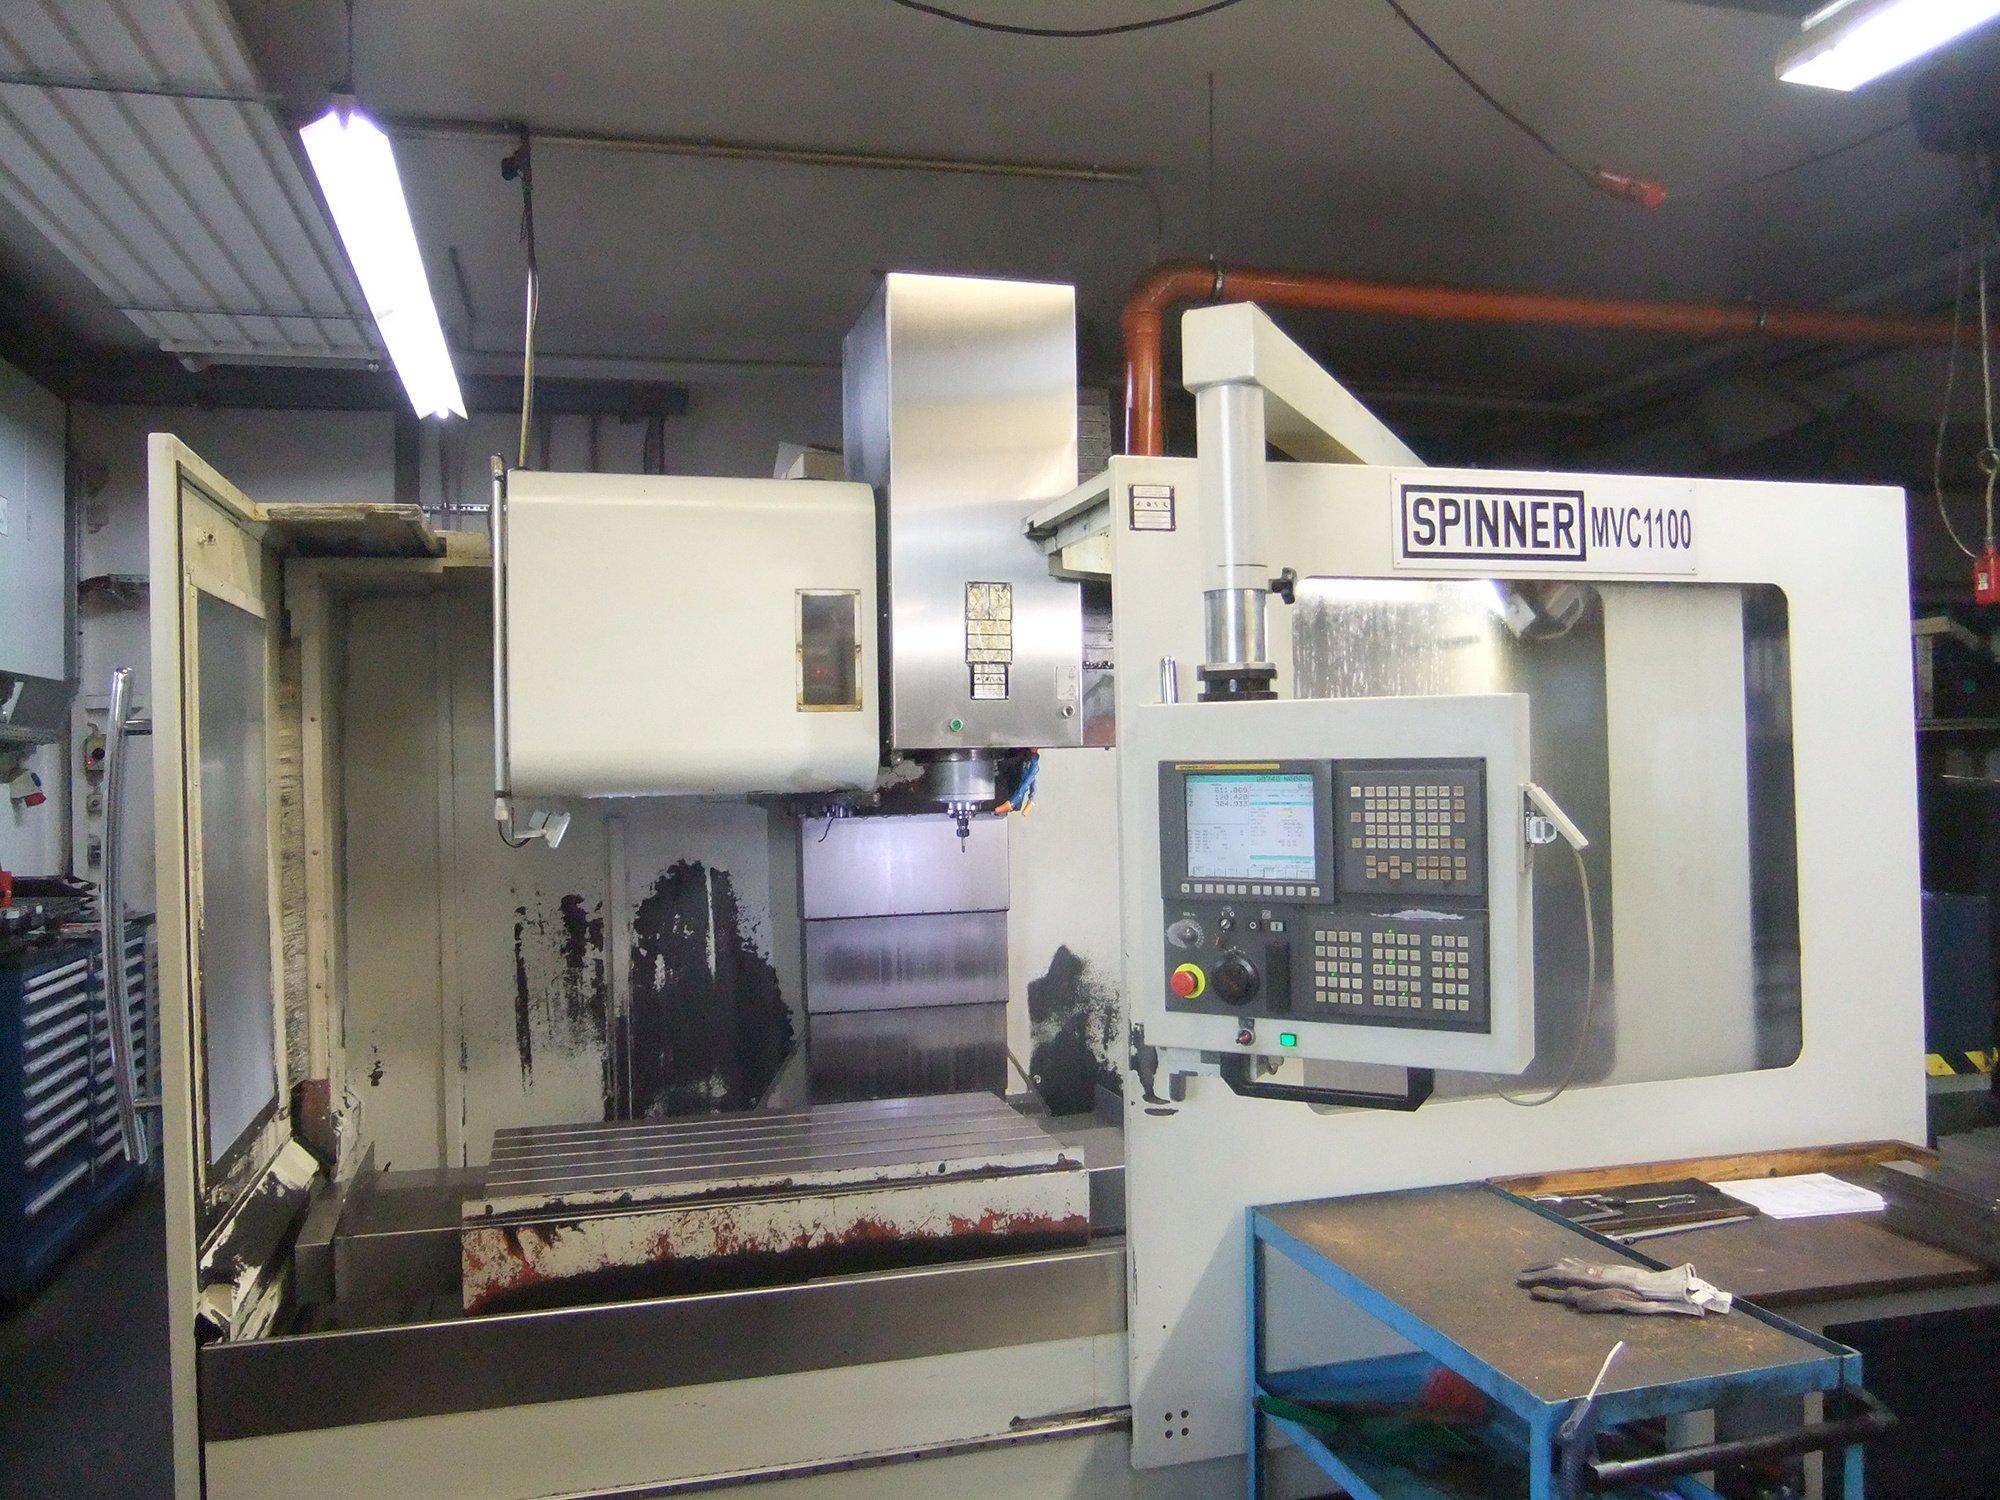 SPINNER MVC1100 Milling Machine